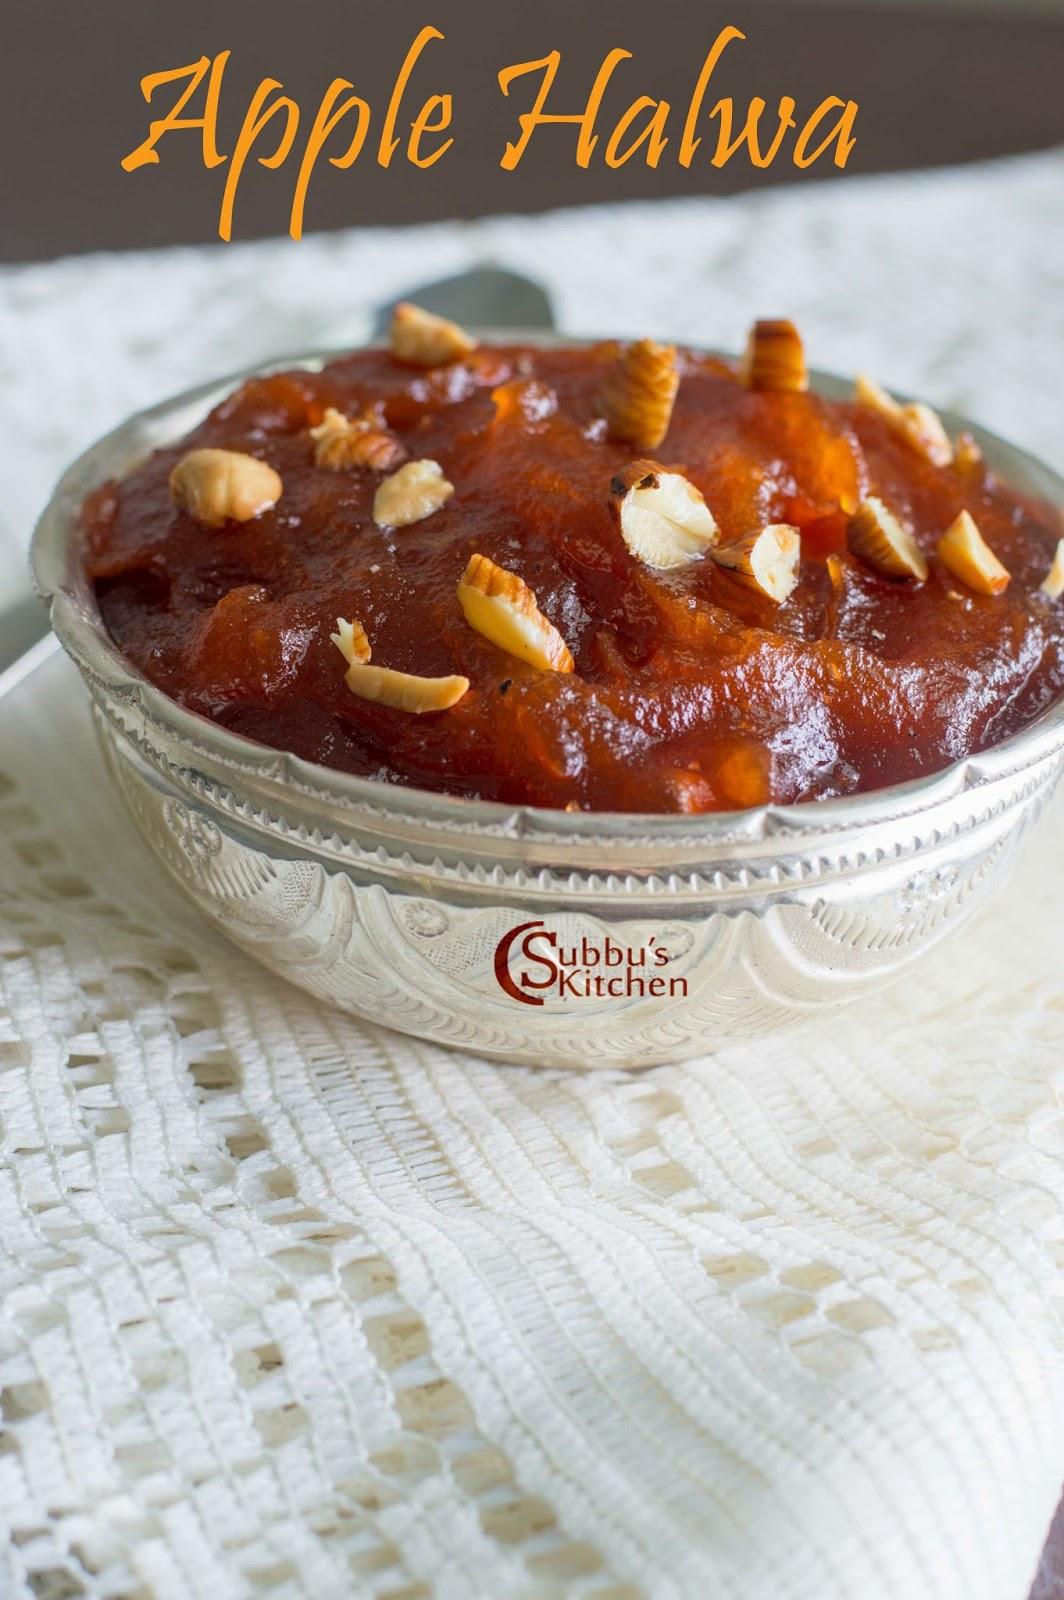 Apple Halwa Recipe | How to make Apple Halwa | Subbus Kitchen